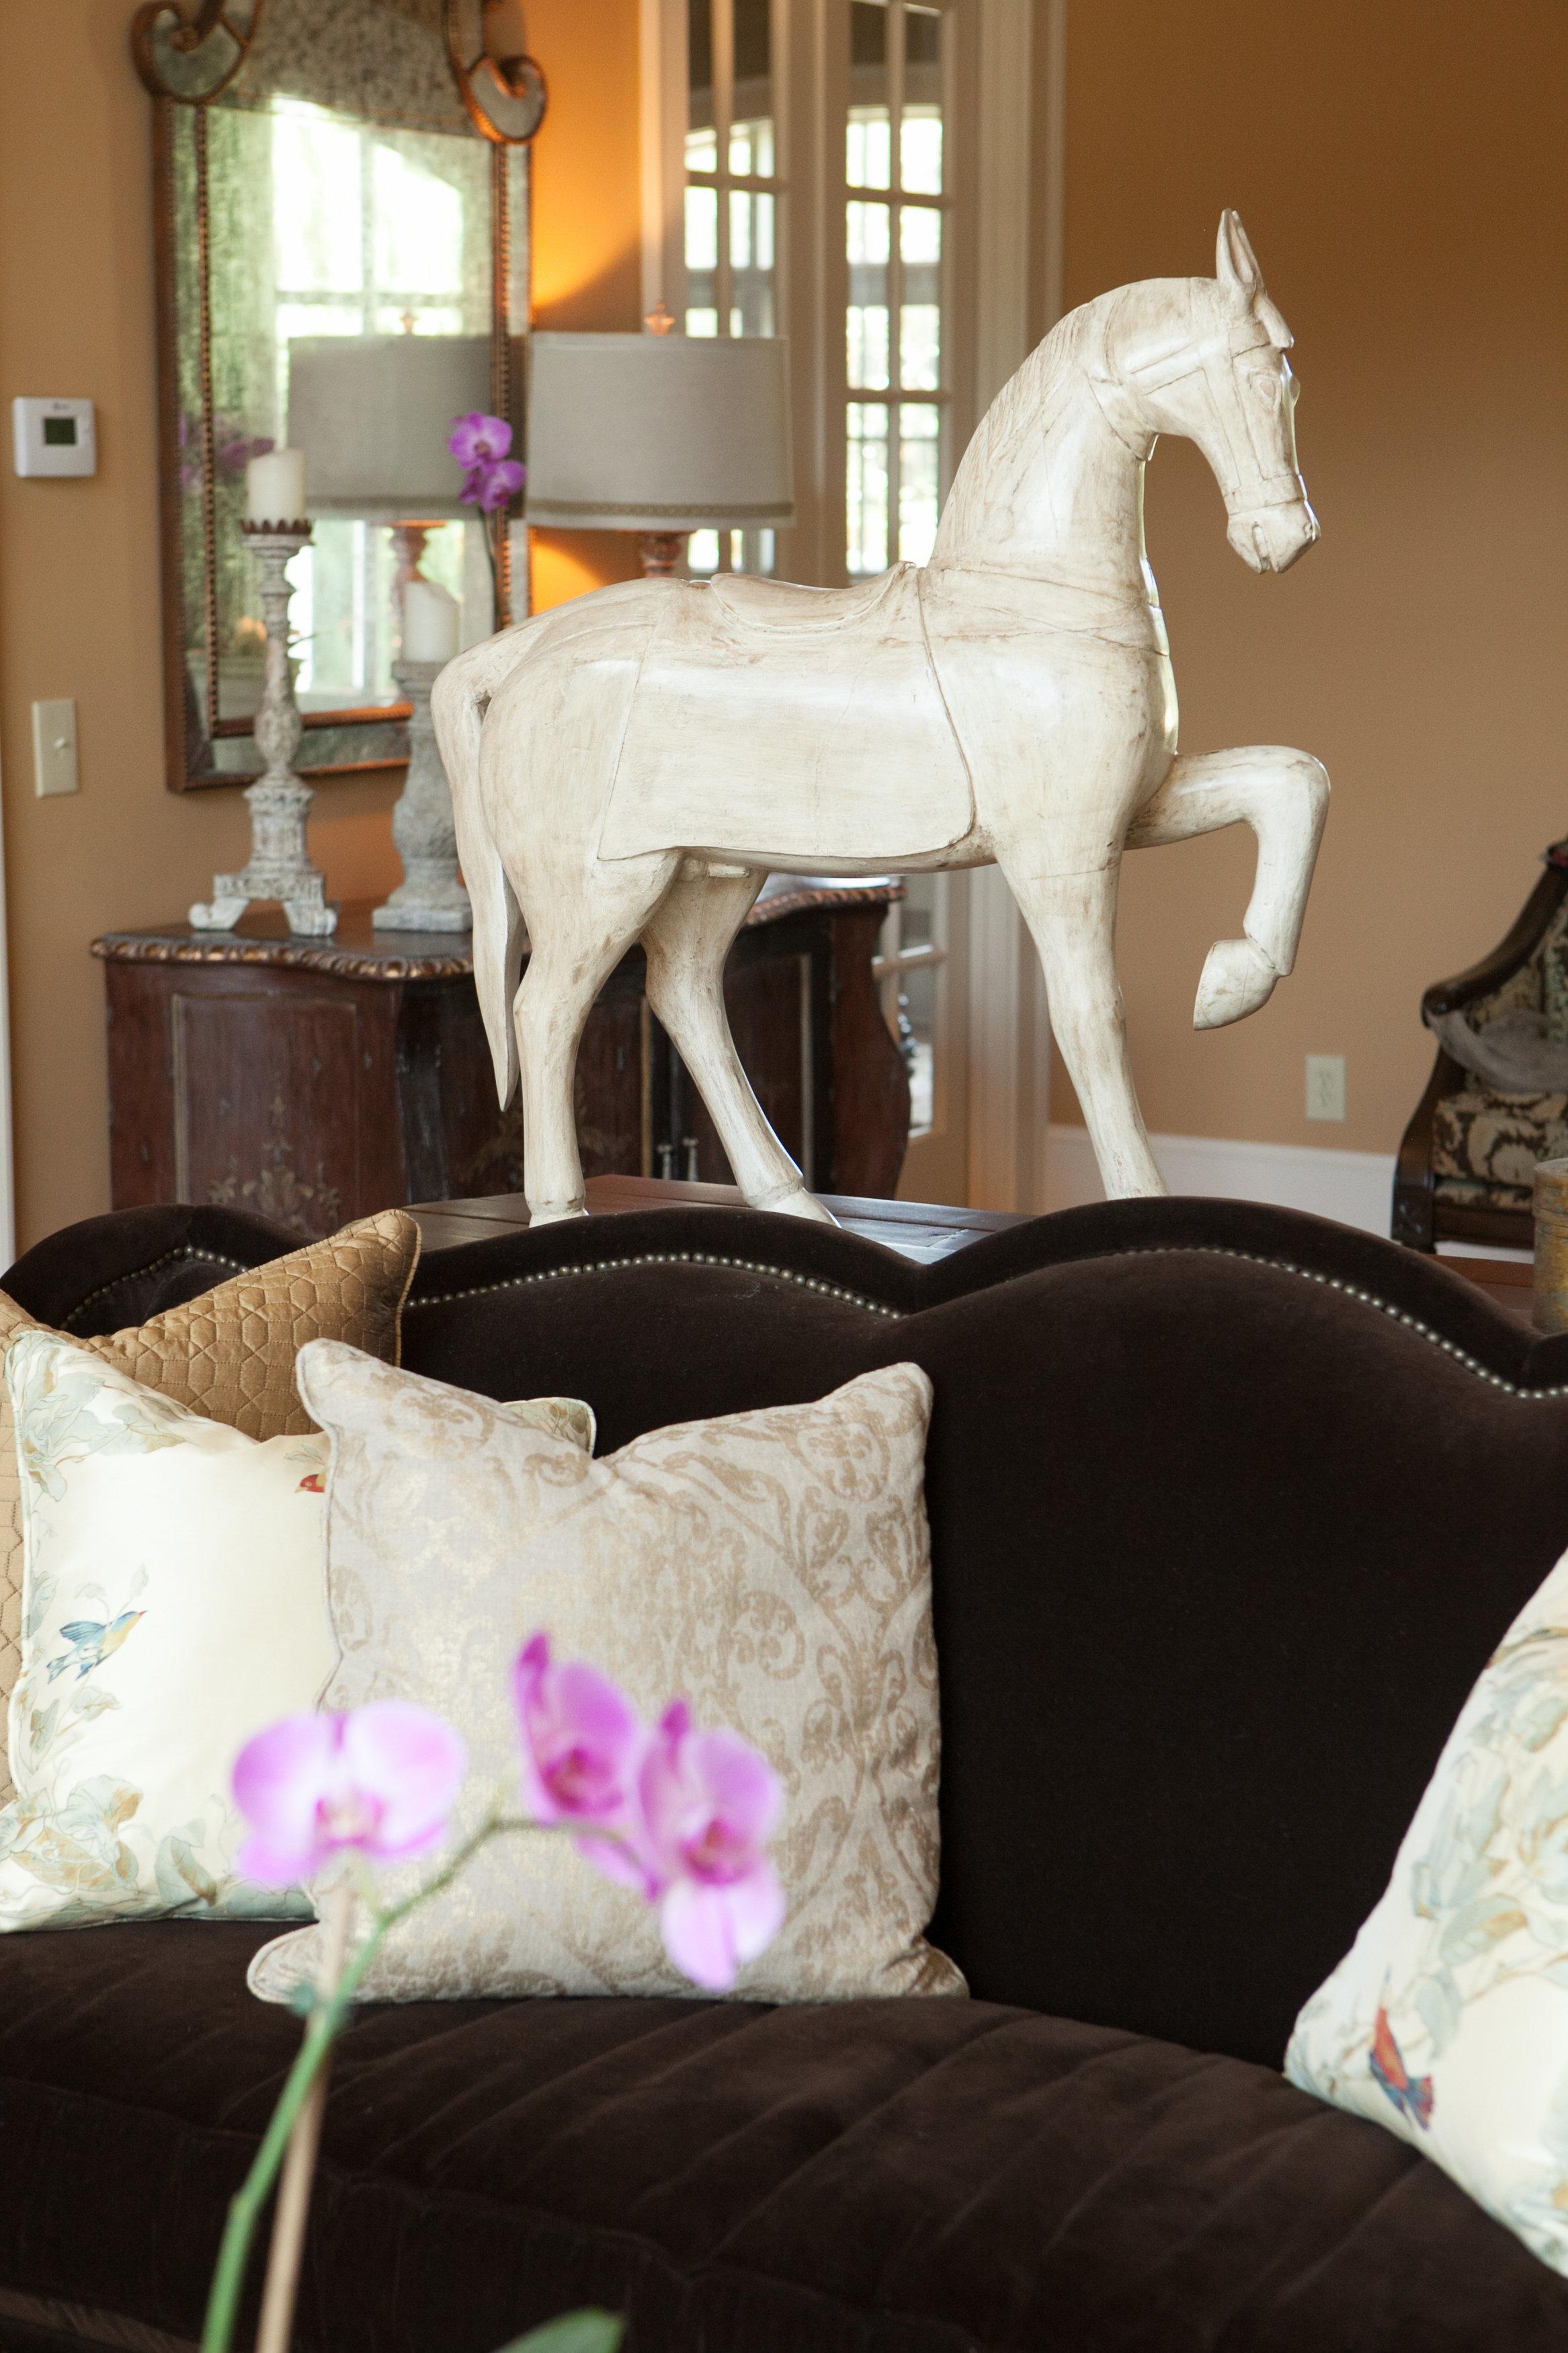 sofa and horse.jpg